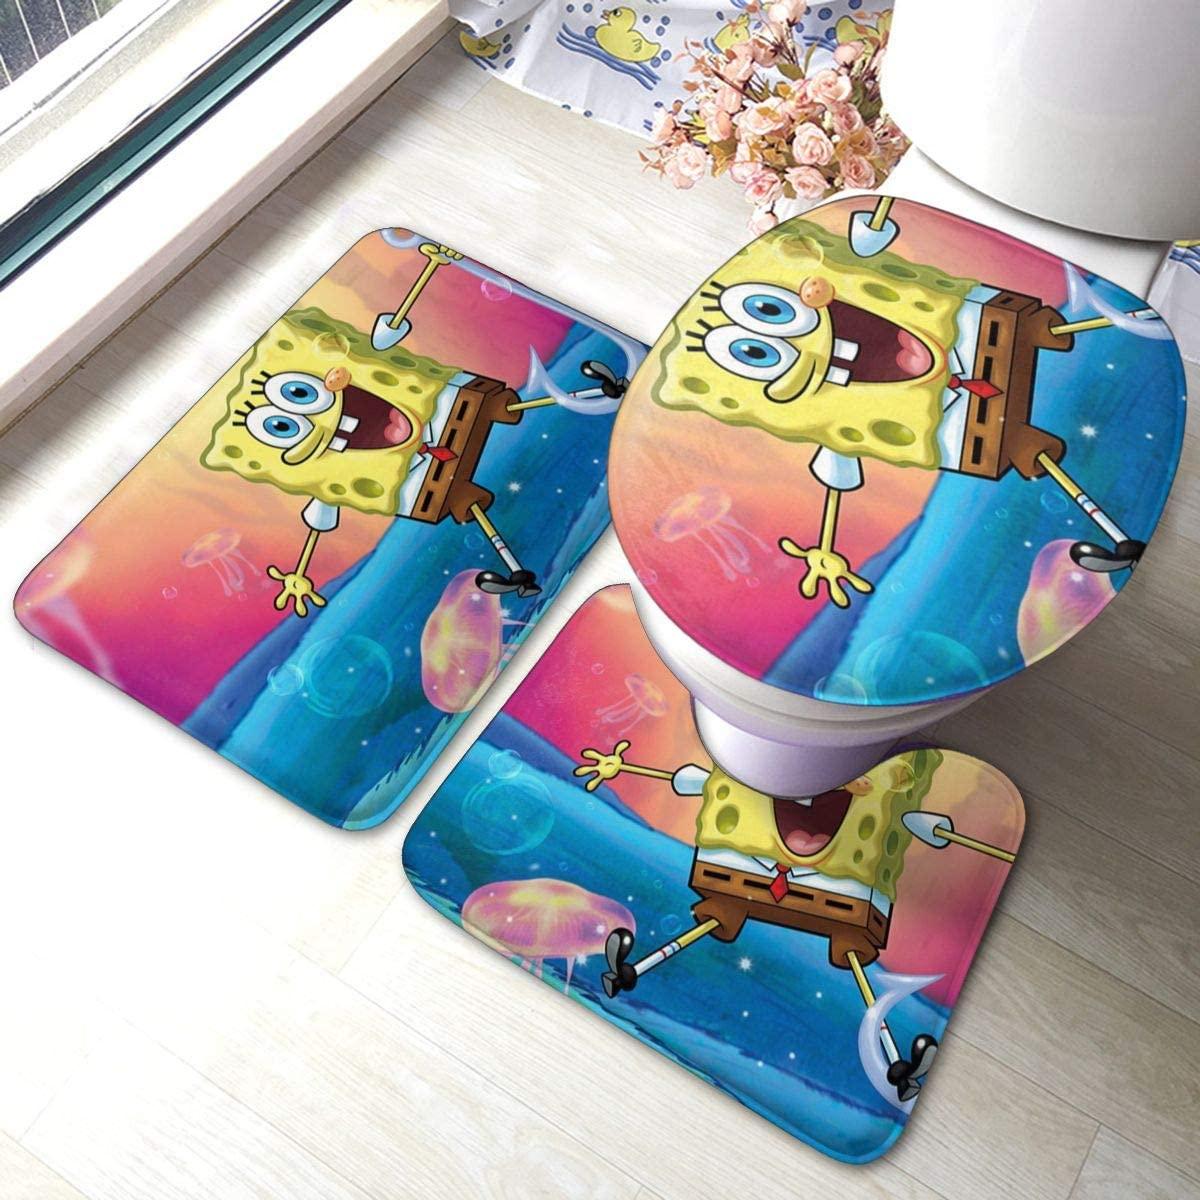 Tticus Cromwell 3 Piece Non-Slip Bathroom Rugs Spongebob Squarepants 353 Bath Doormat Anti-Skid Pads Bath Mat + U Shaped Contour Rug+Toilet Seat Cover